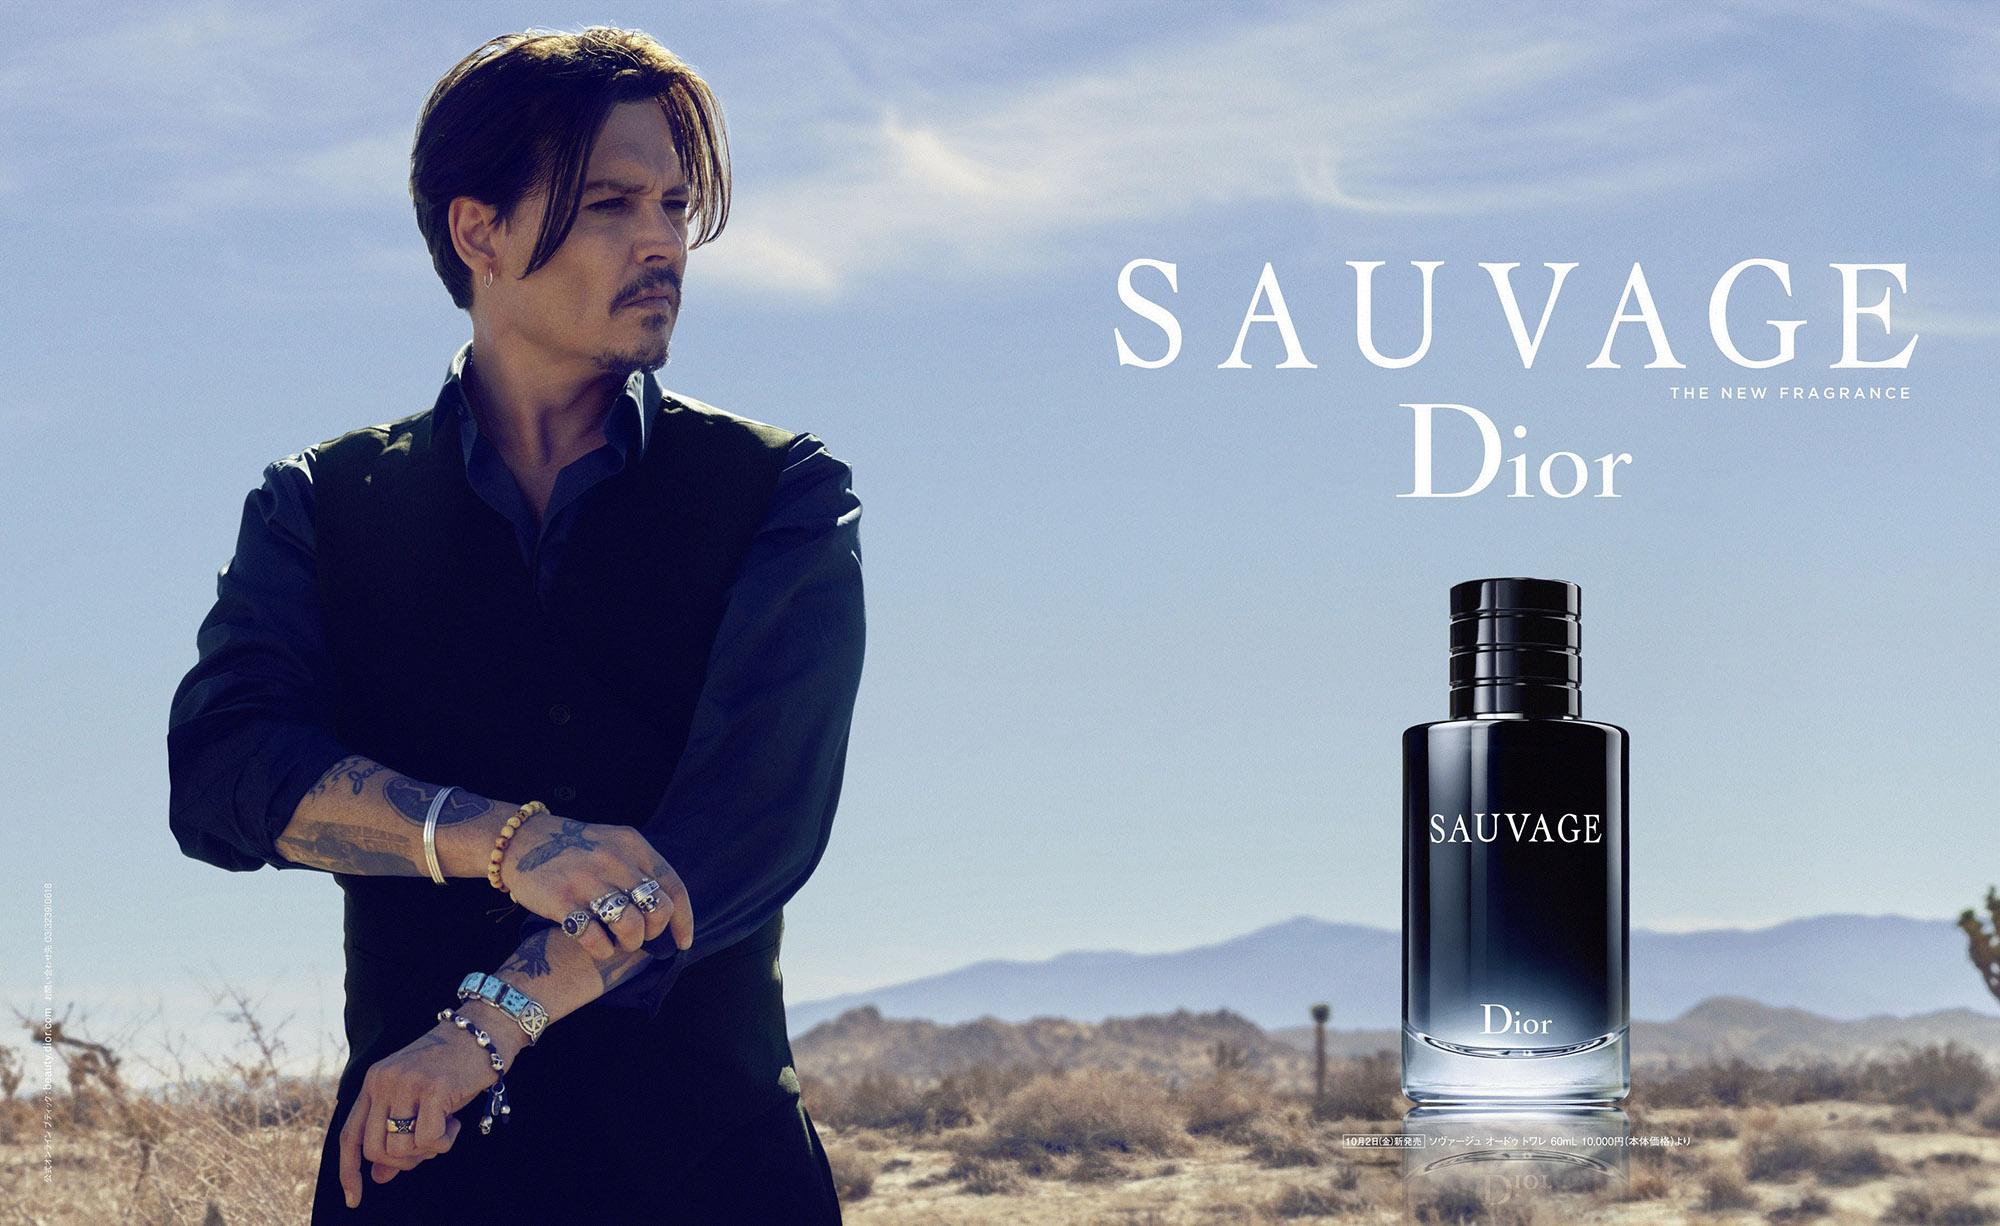 low priced 04f8d bf2db Dior (ディオール) から10年ぶりとなるメンズフレグランスが発売 ...